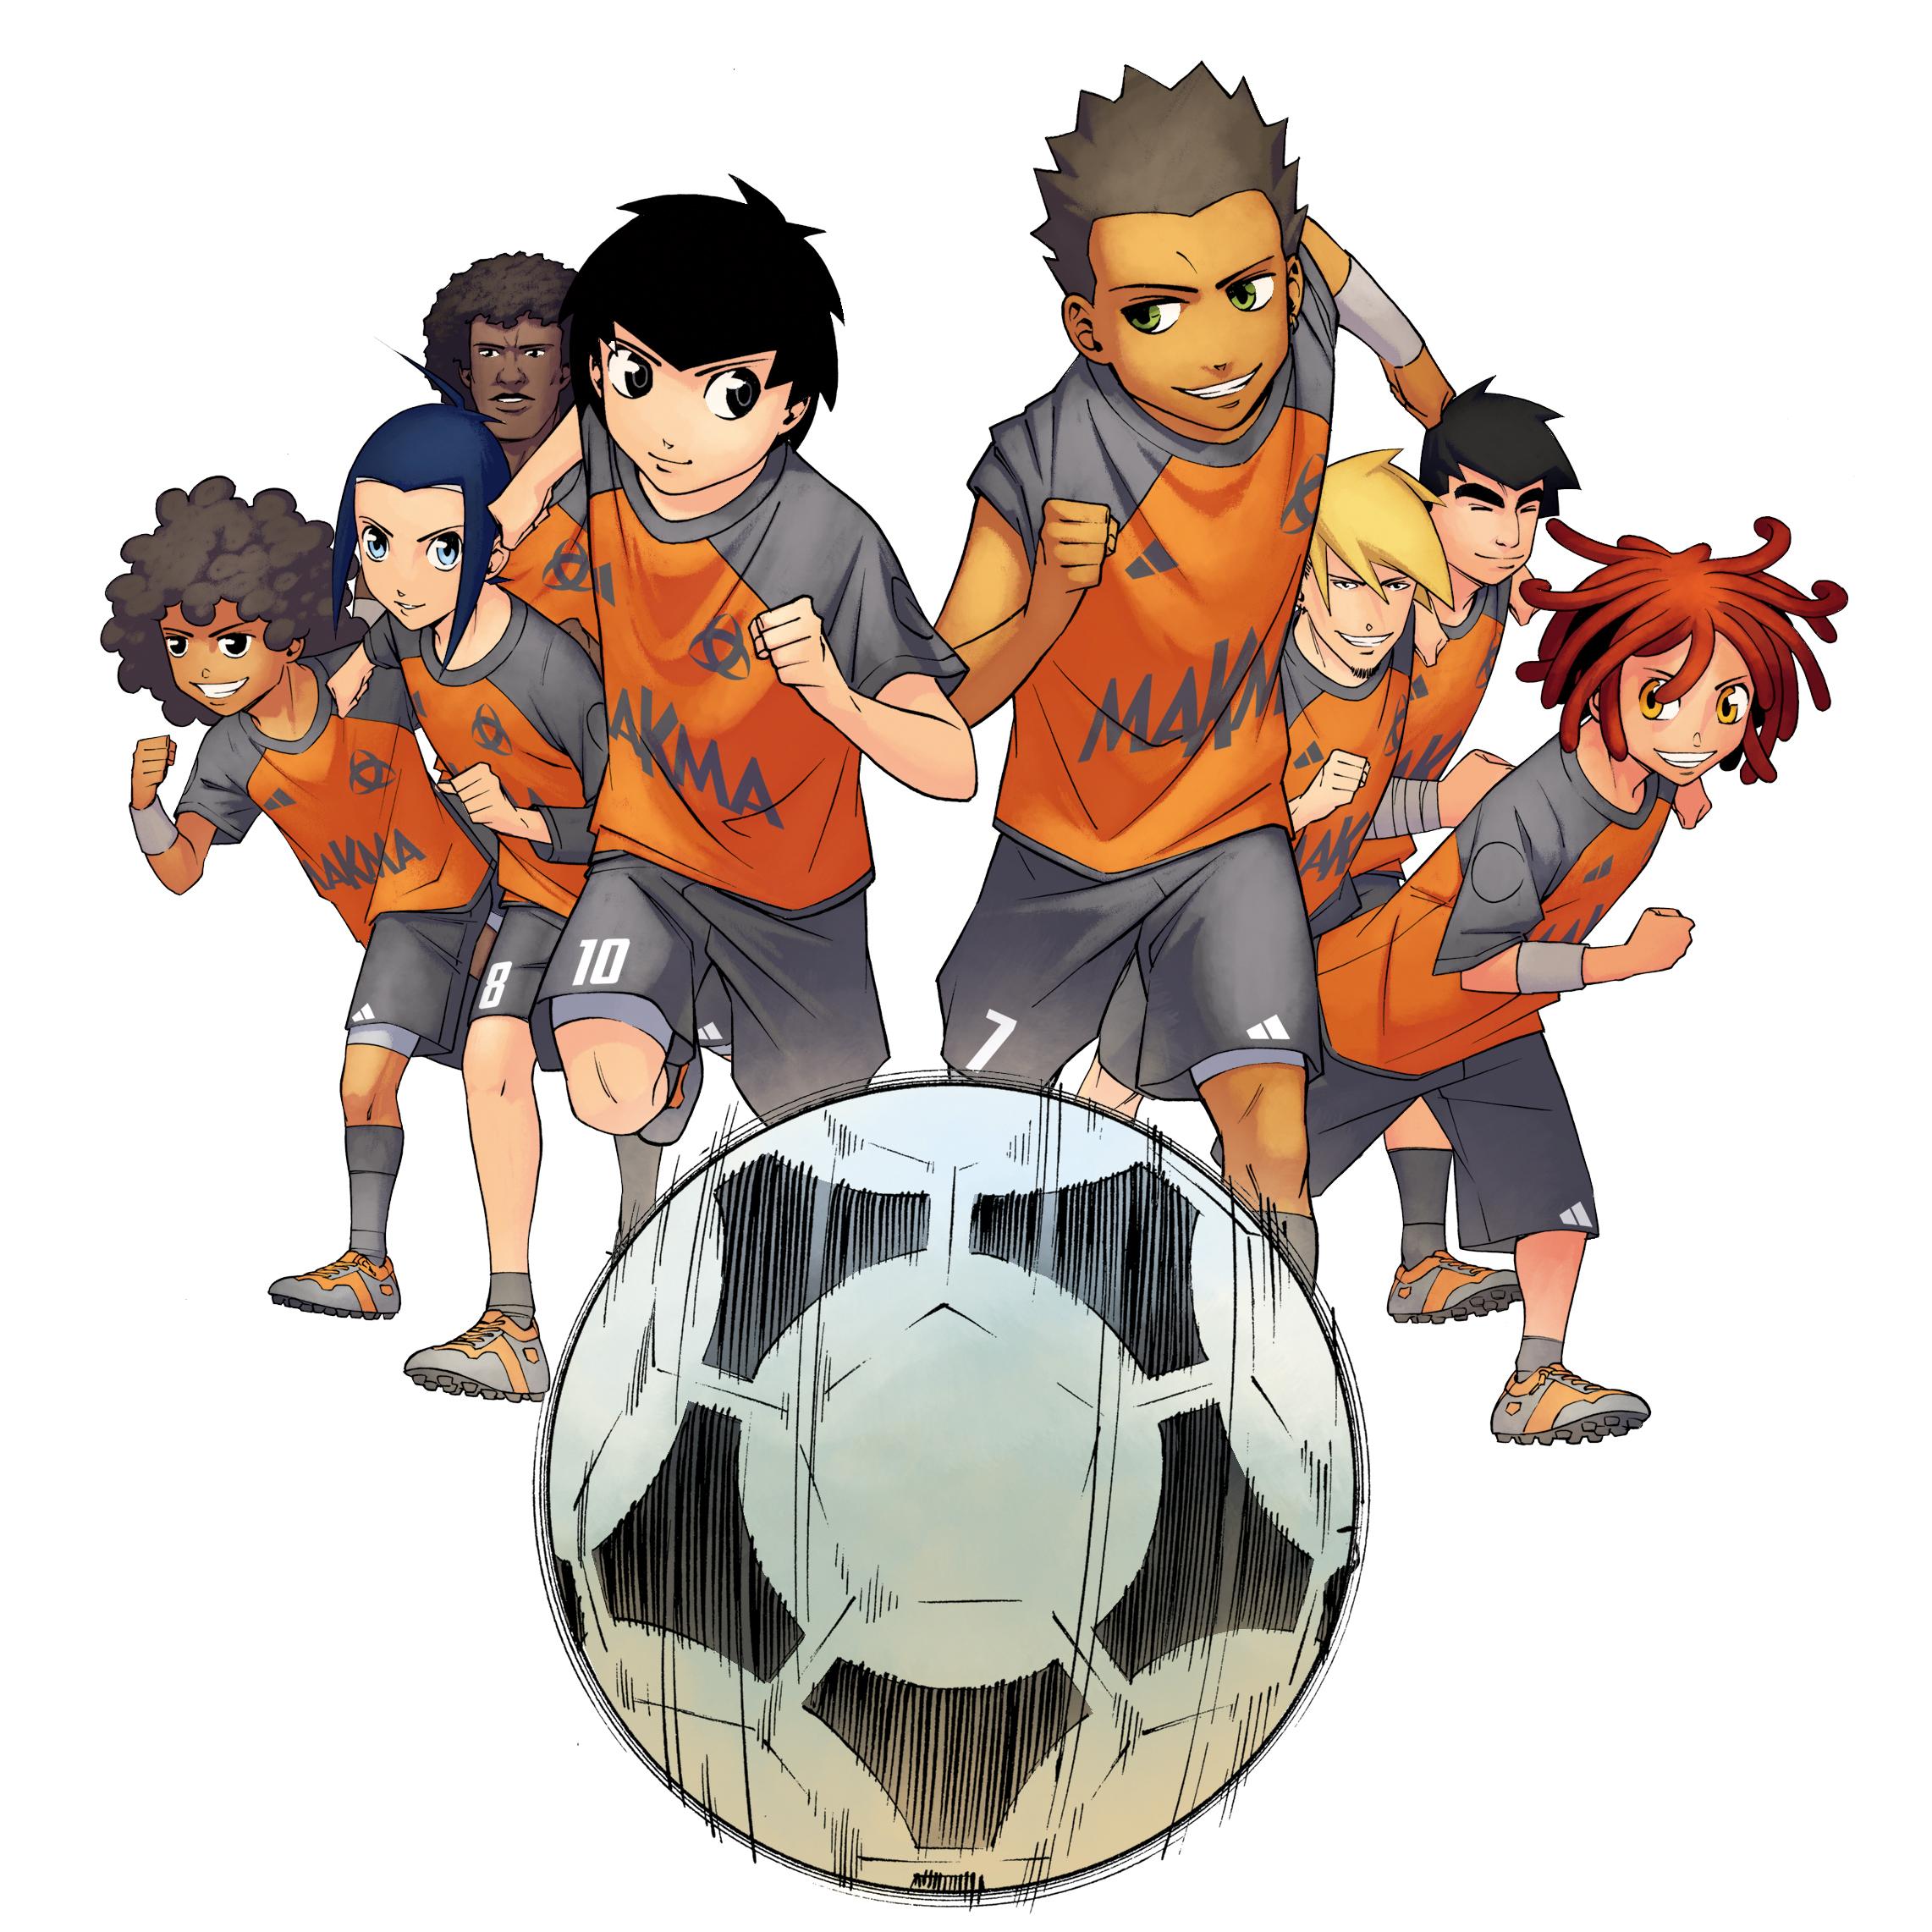 L 39 quipe z bient t le tome 2 du manga foot flibusk - Dessin equipe de foot ...